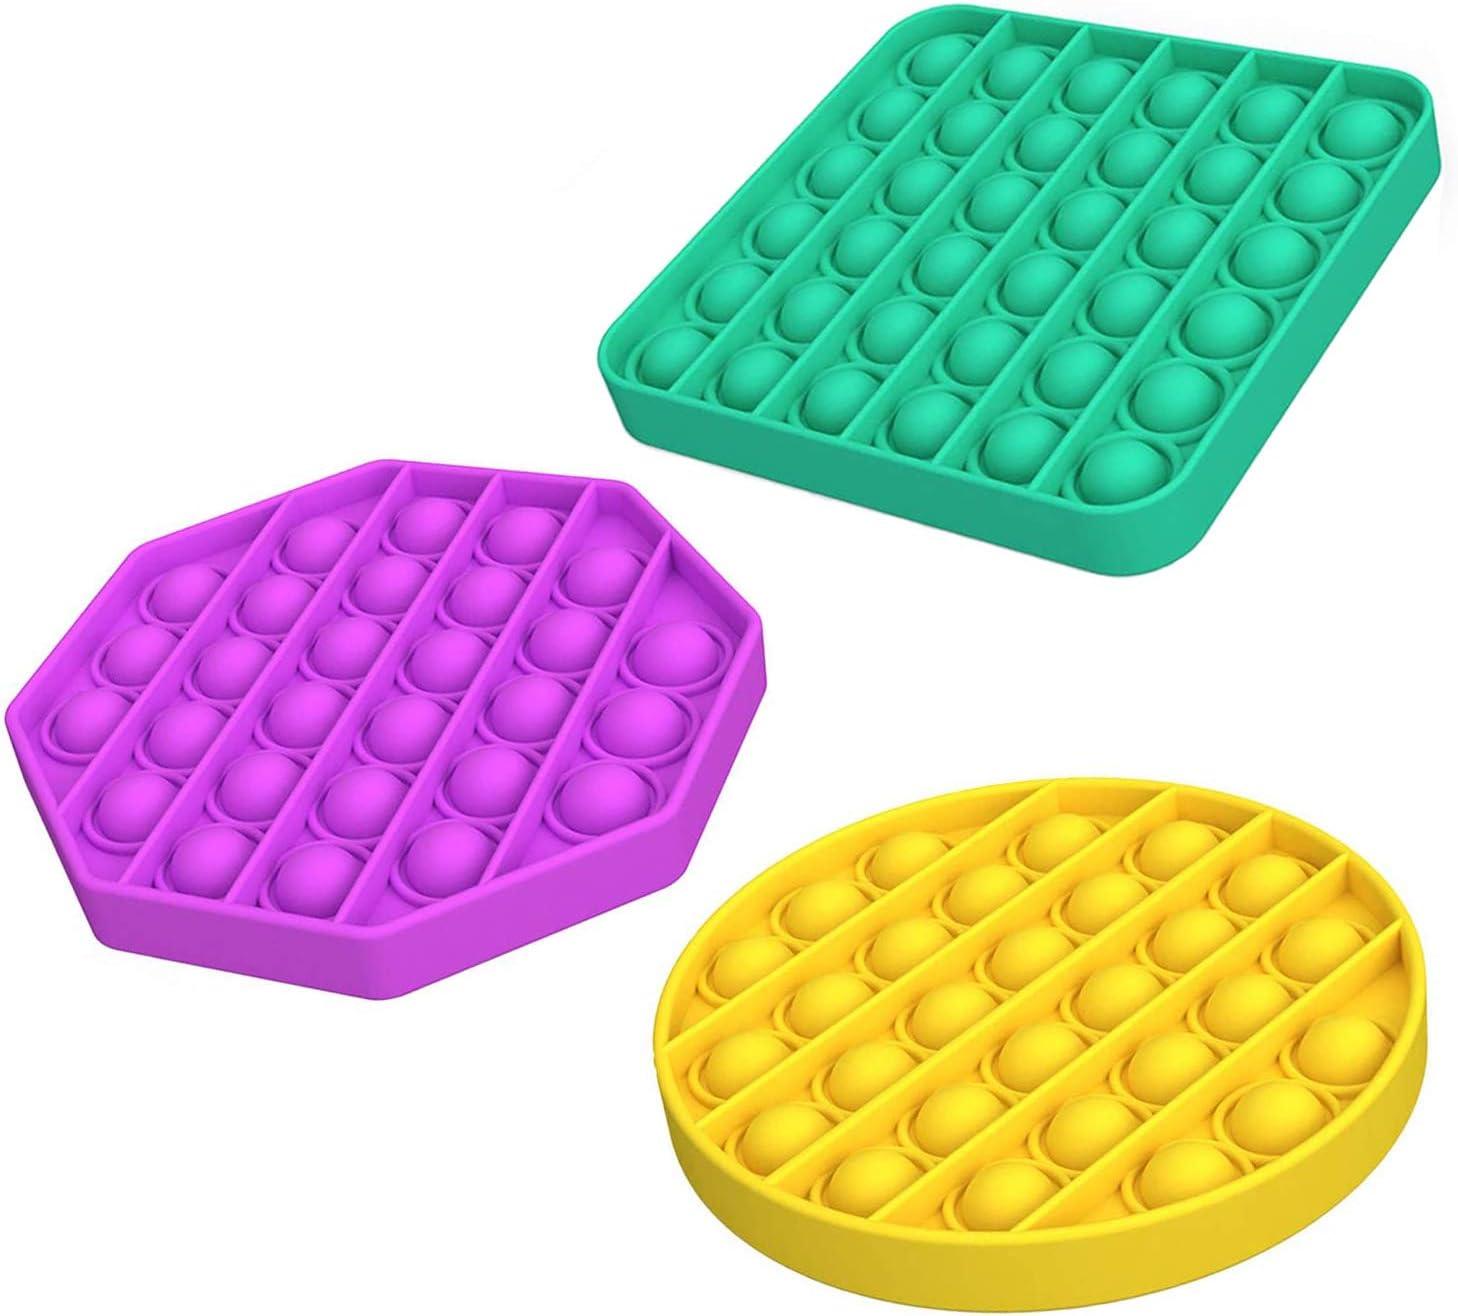 Push Pop Bubble Sensory Fidget Louisville-Jefferson County Mall Toy STEM Set Max 71% OFF - Anxiety Ite Relief